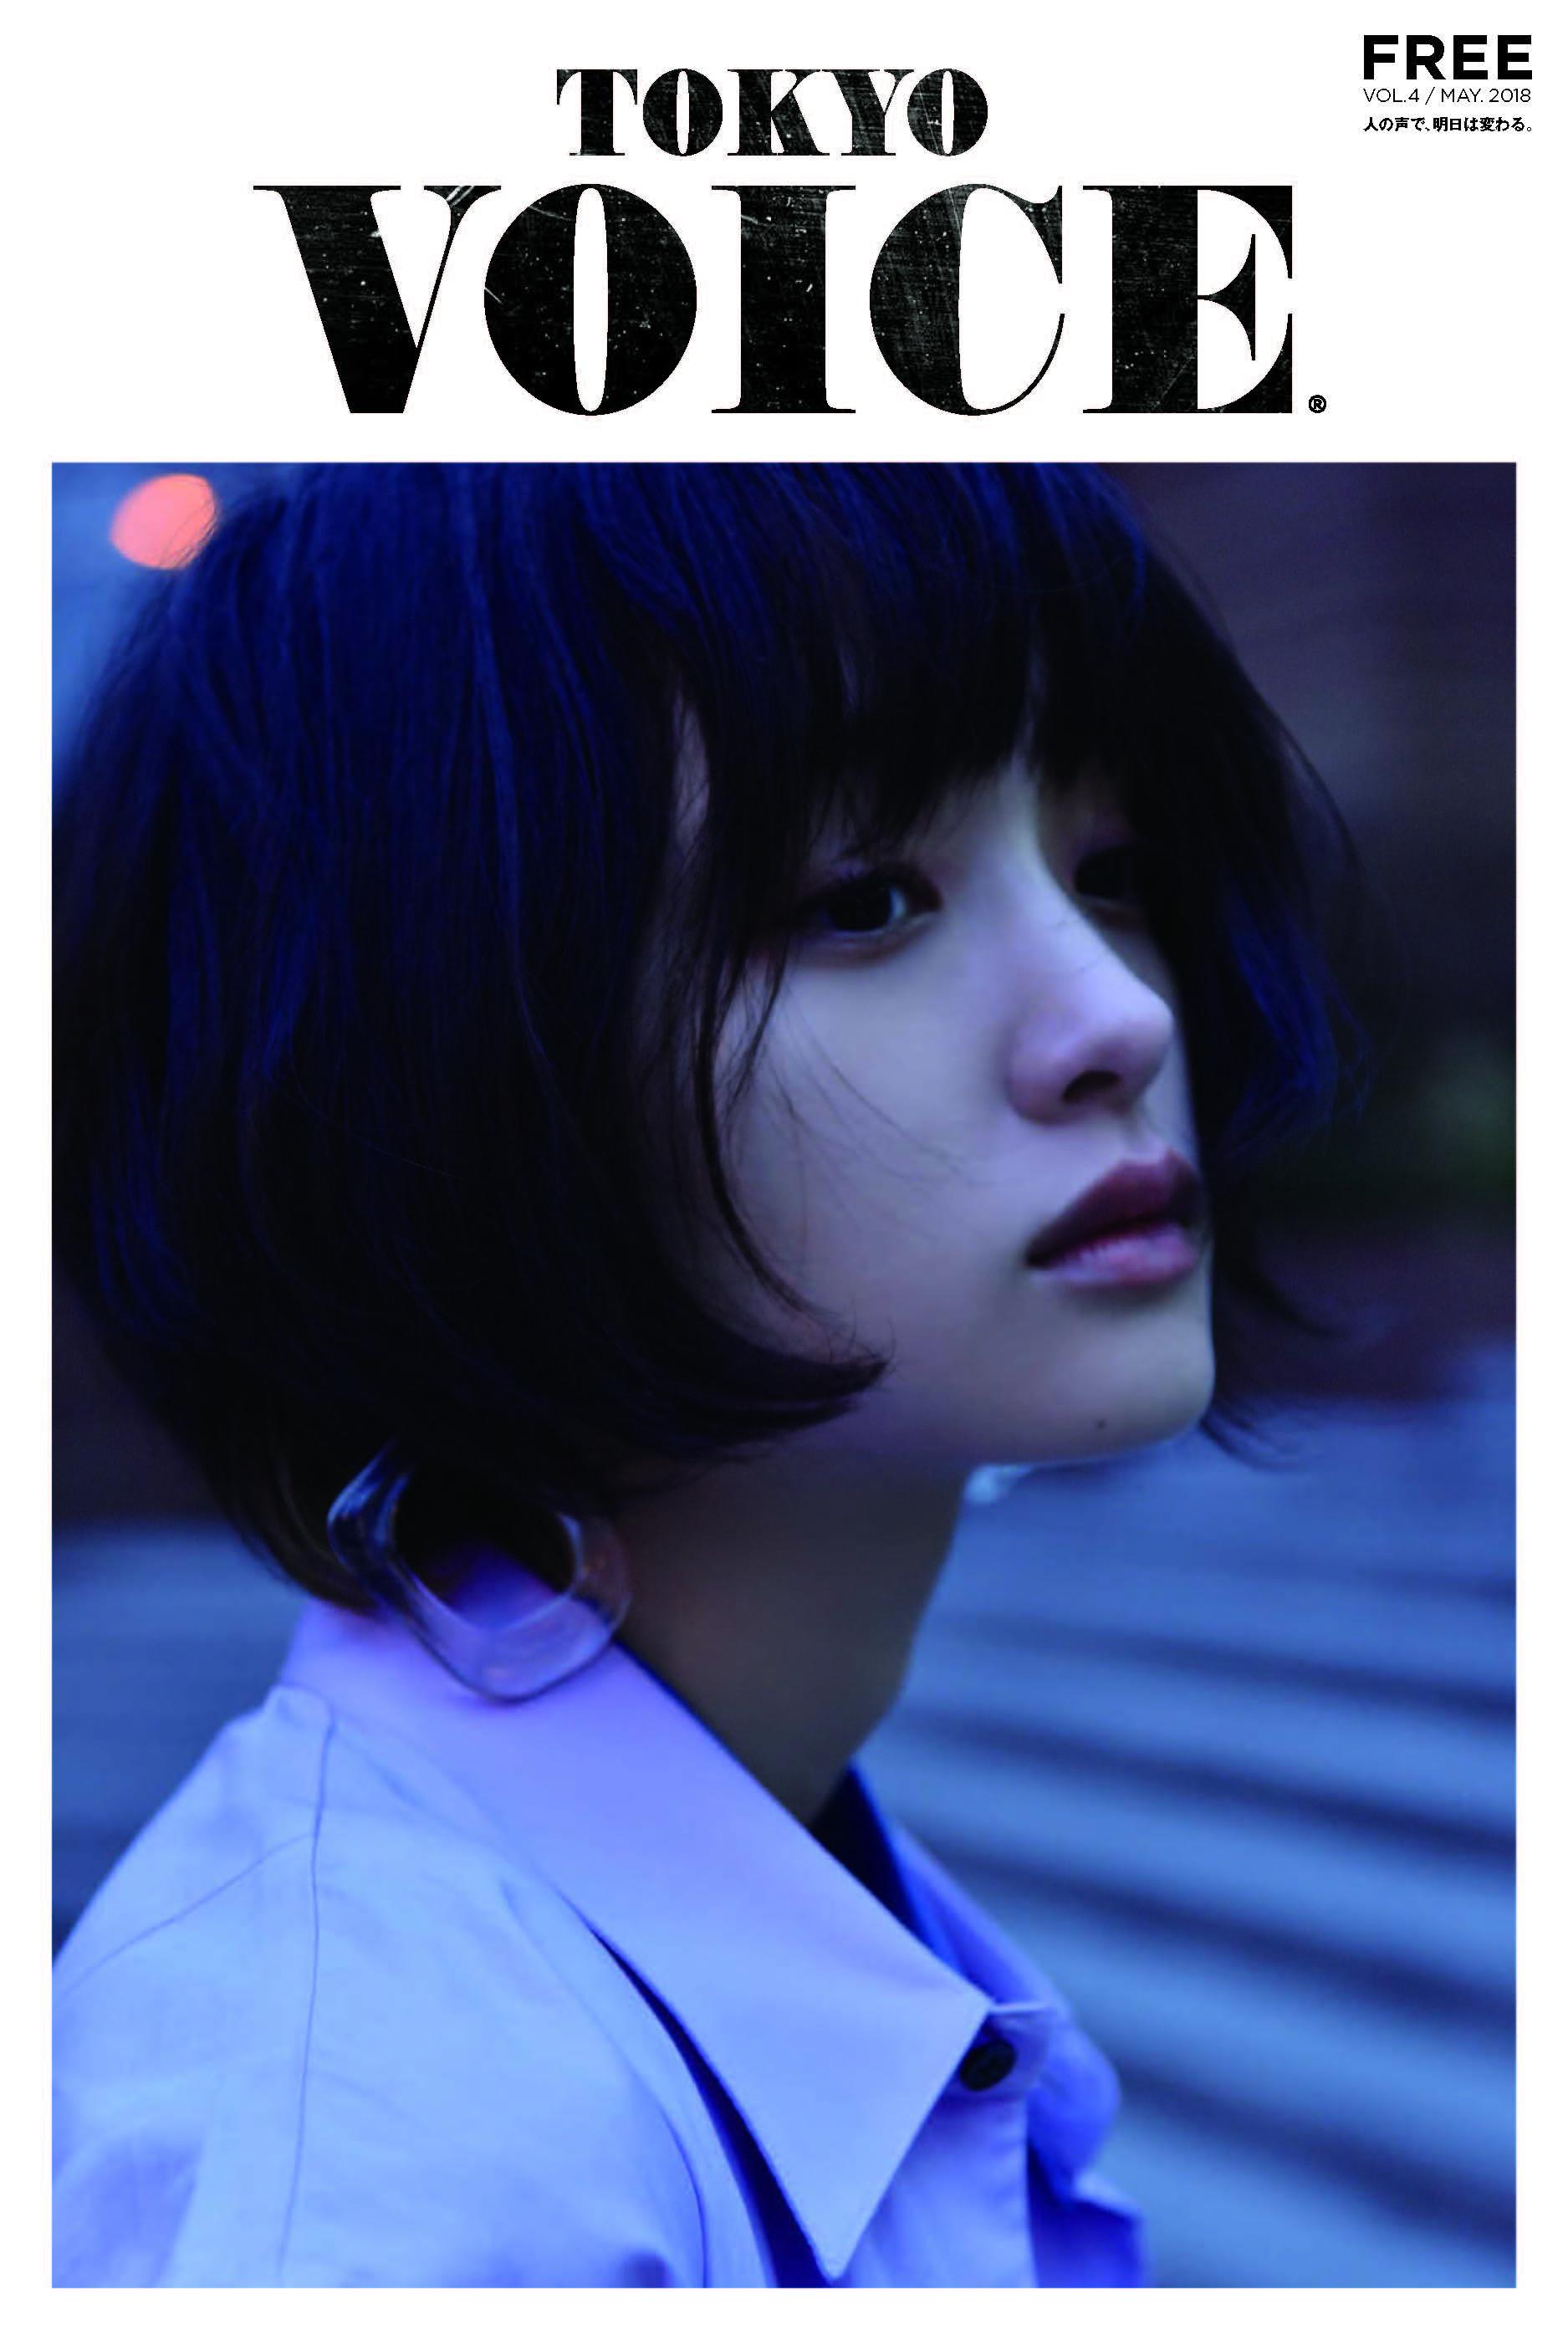 TV_4_p01-40_文字校正用_ページ_01.jpg